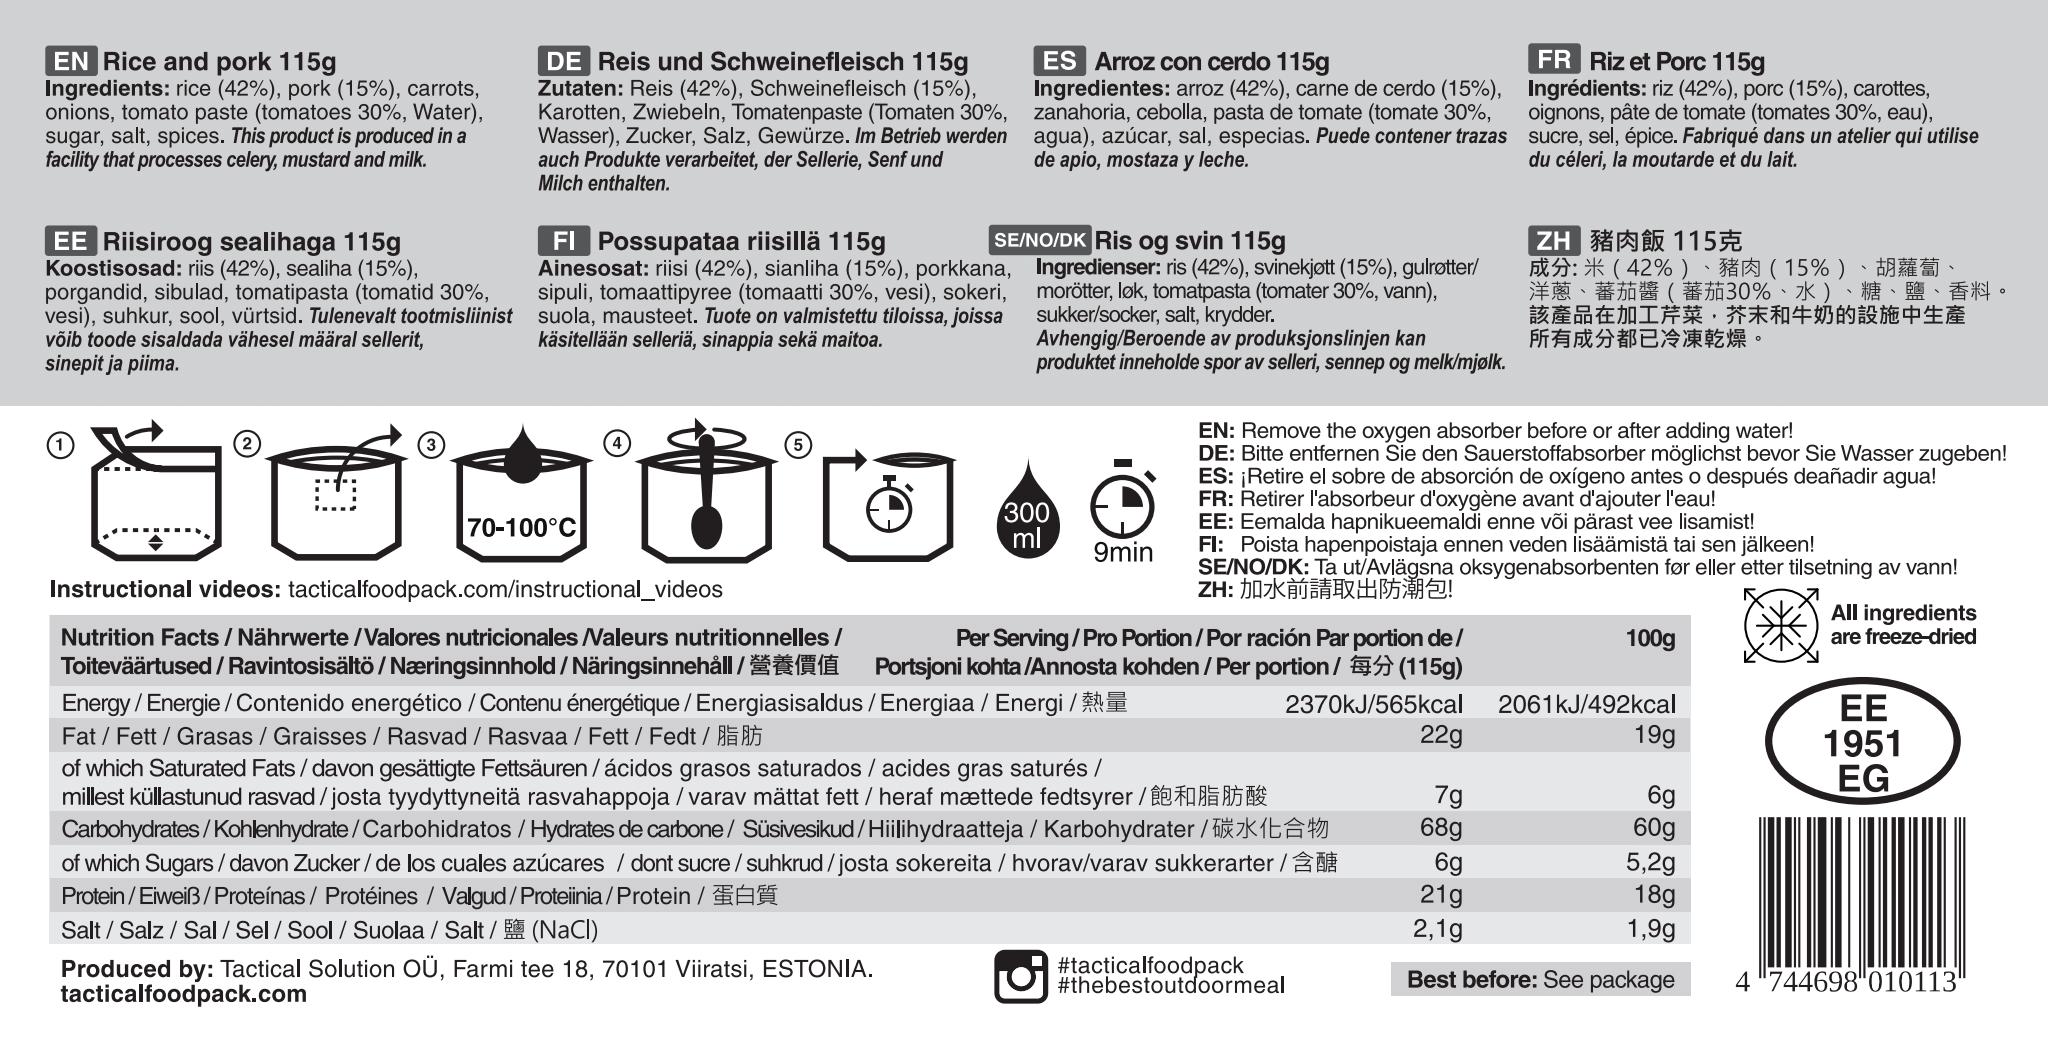 Dehidrirana hrana Tactical Foodpack - Rice and Pork , B33 army shop at www.opremljen.si, trgovina z vojaško opremo, vojaška trgovina